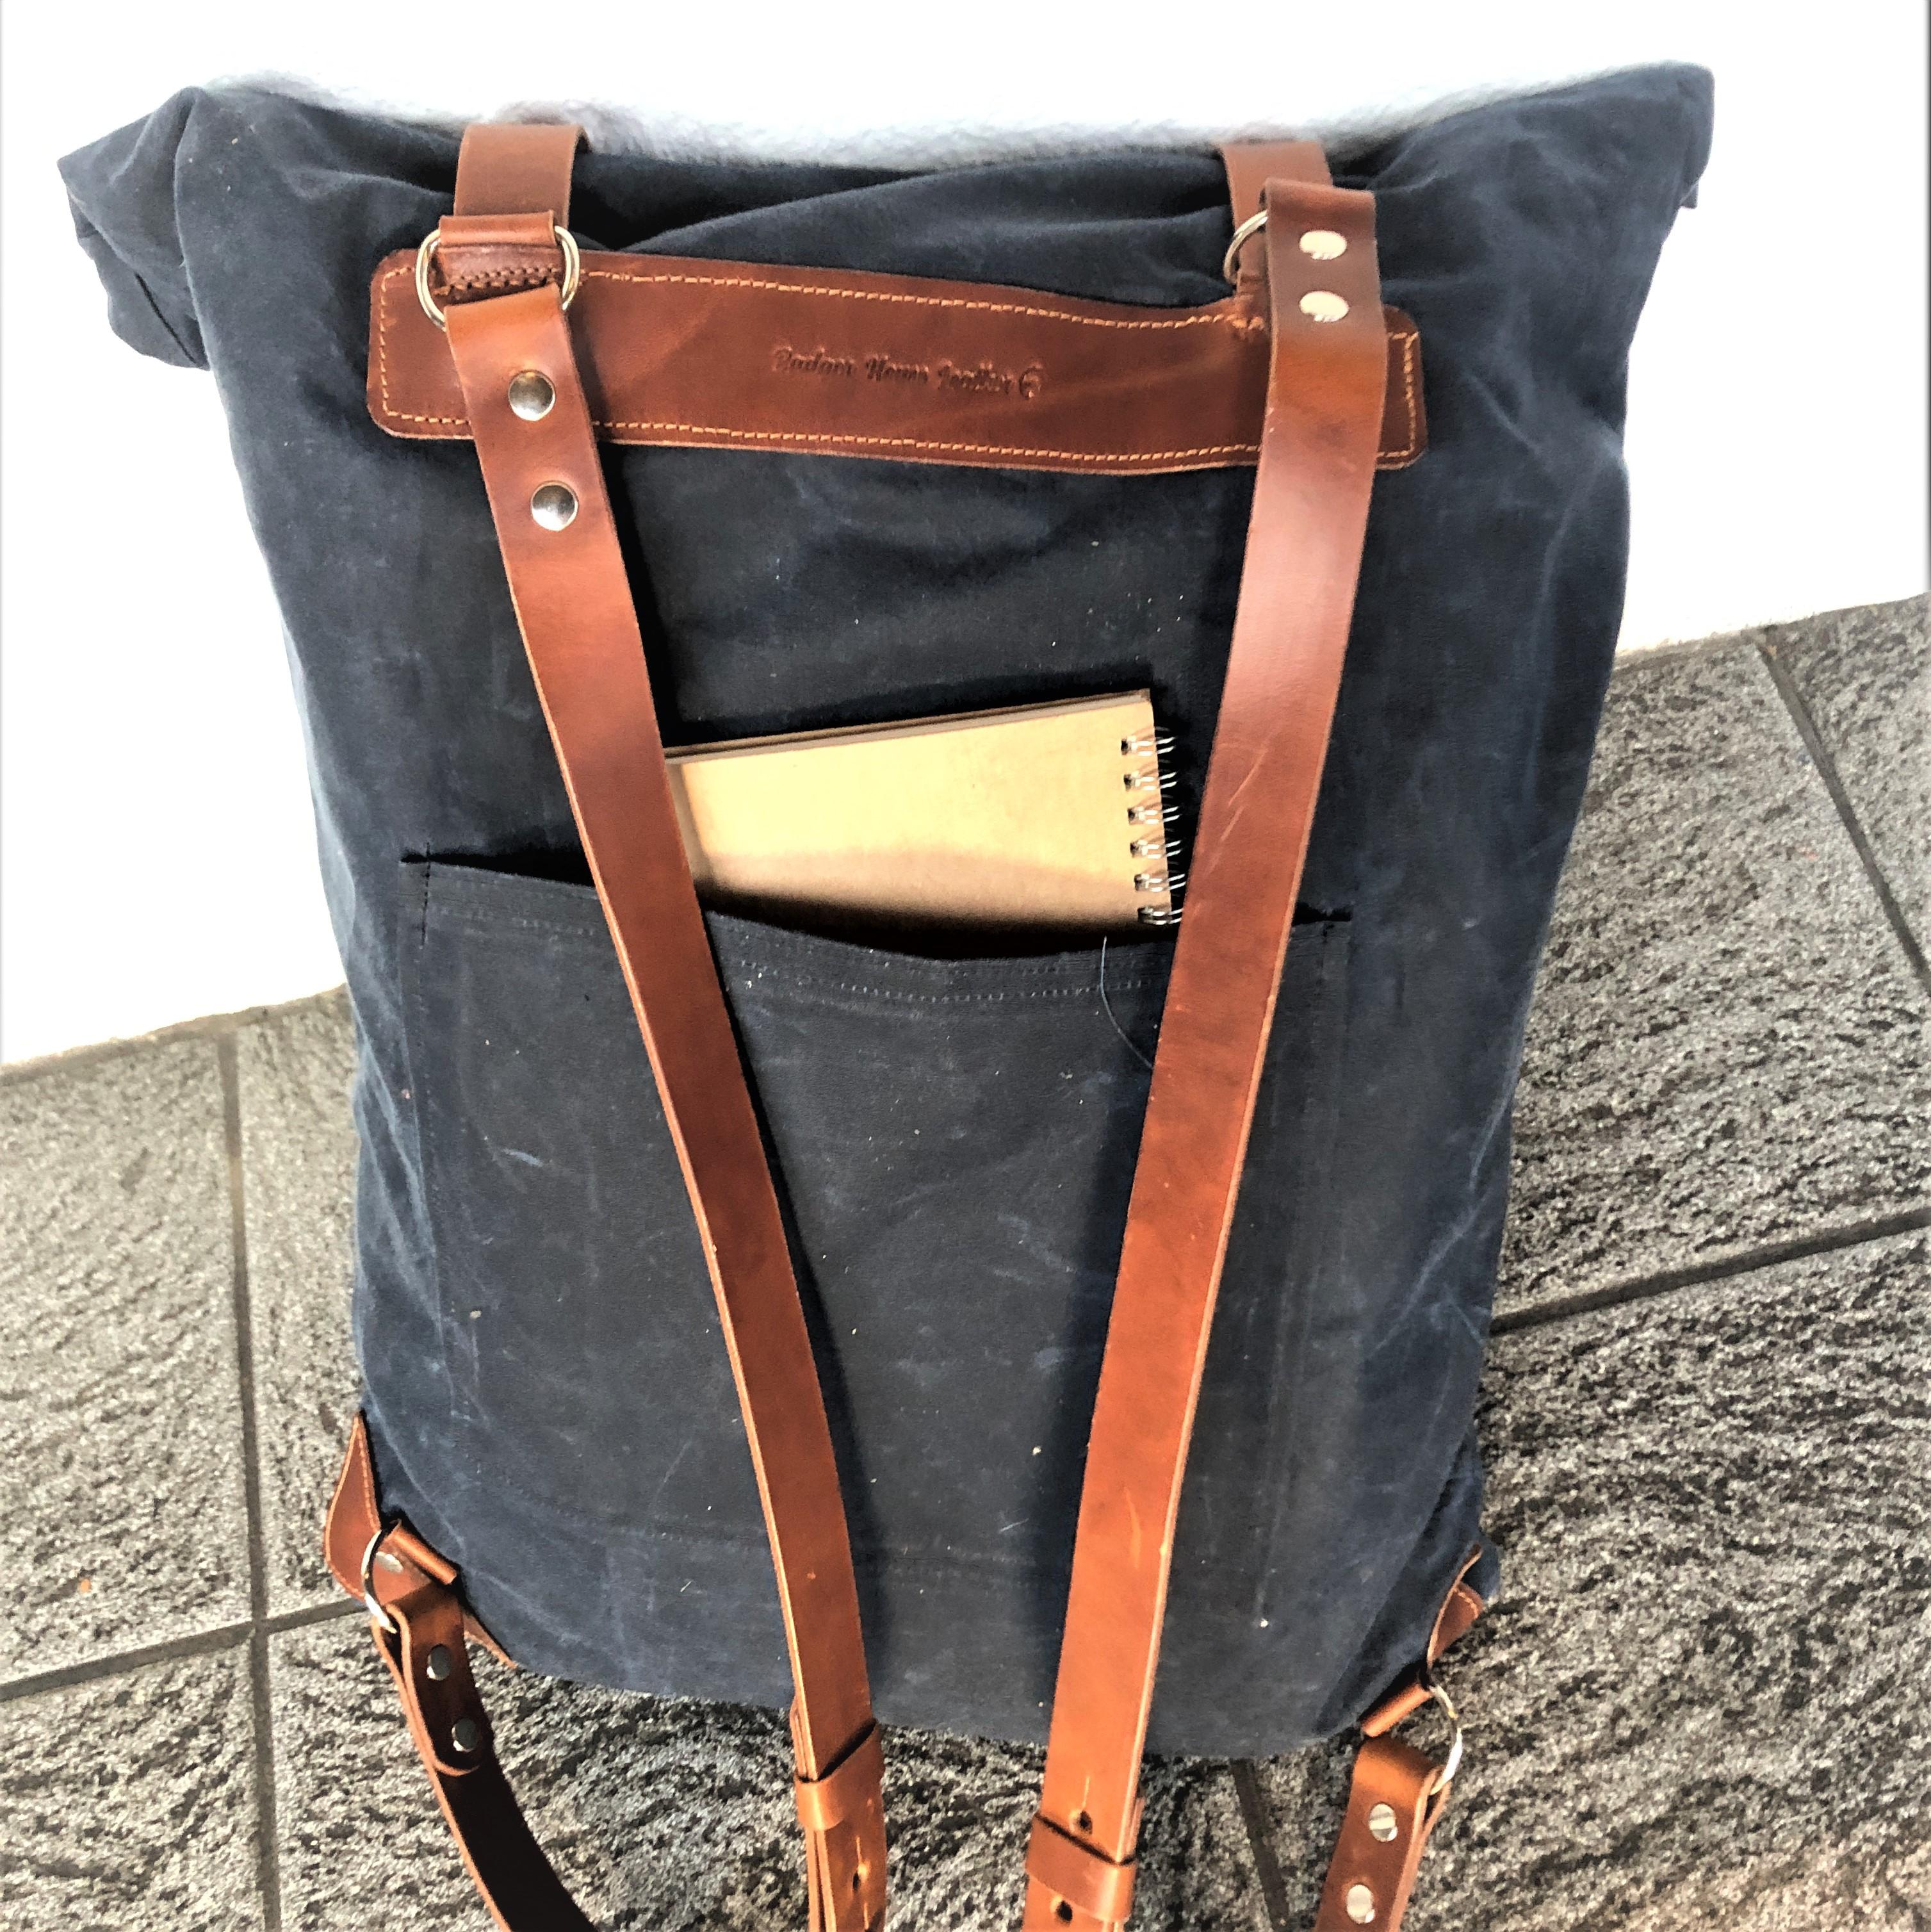 Roll top rucksack